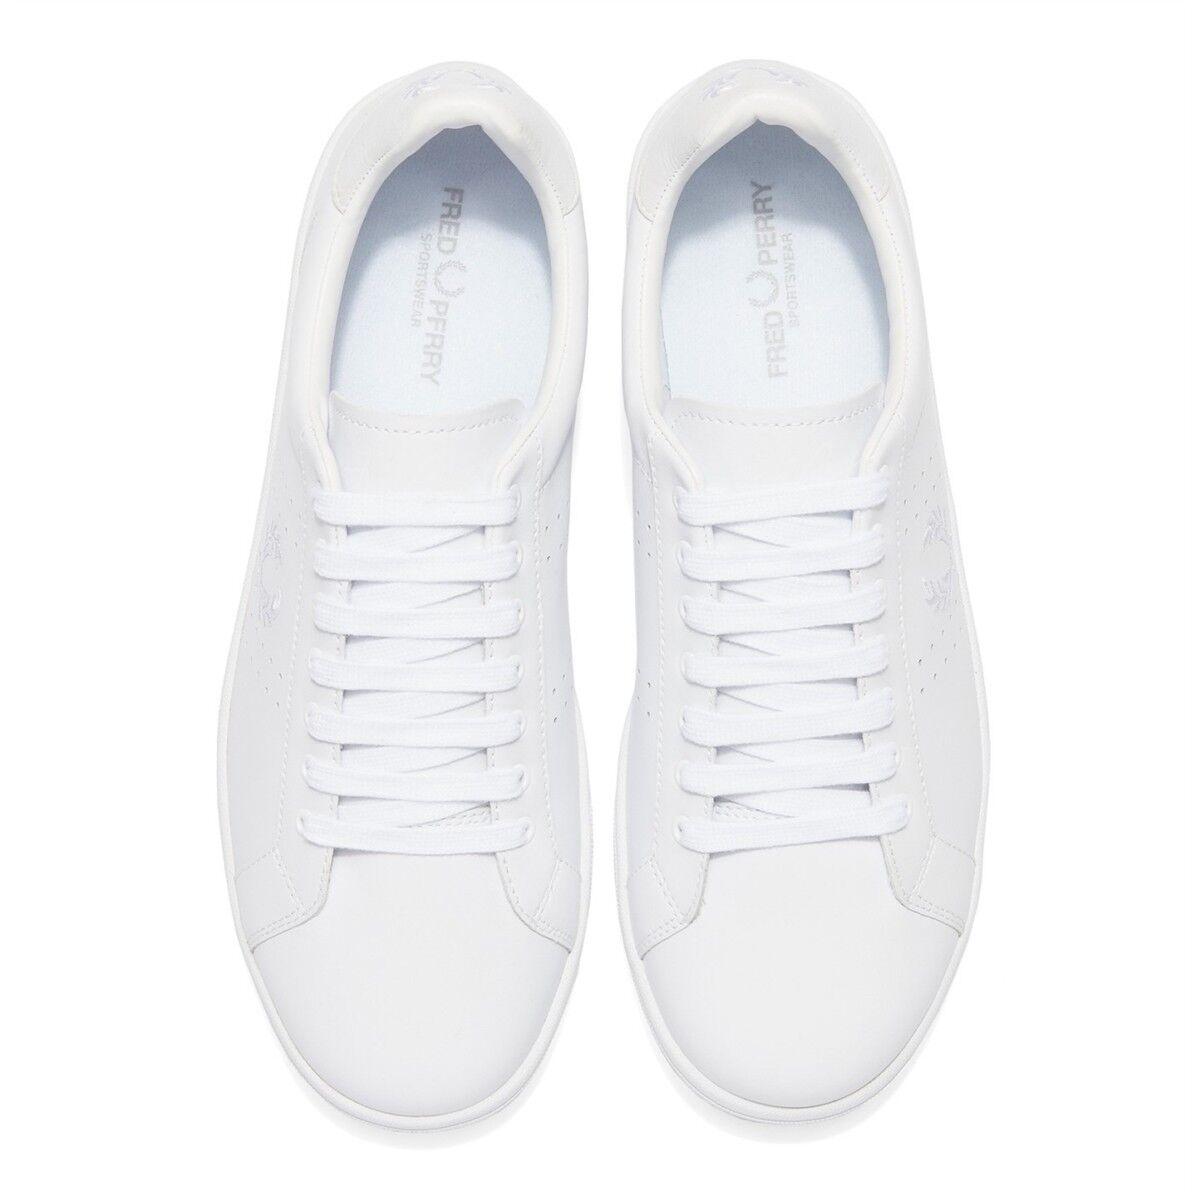 Men Frosso Perry scarpe B721 bianca scarpe da ginnastica ginnastica ginnastica New Authentic be2b21